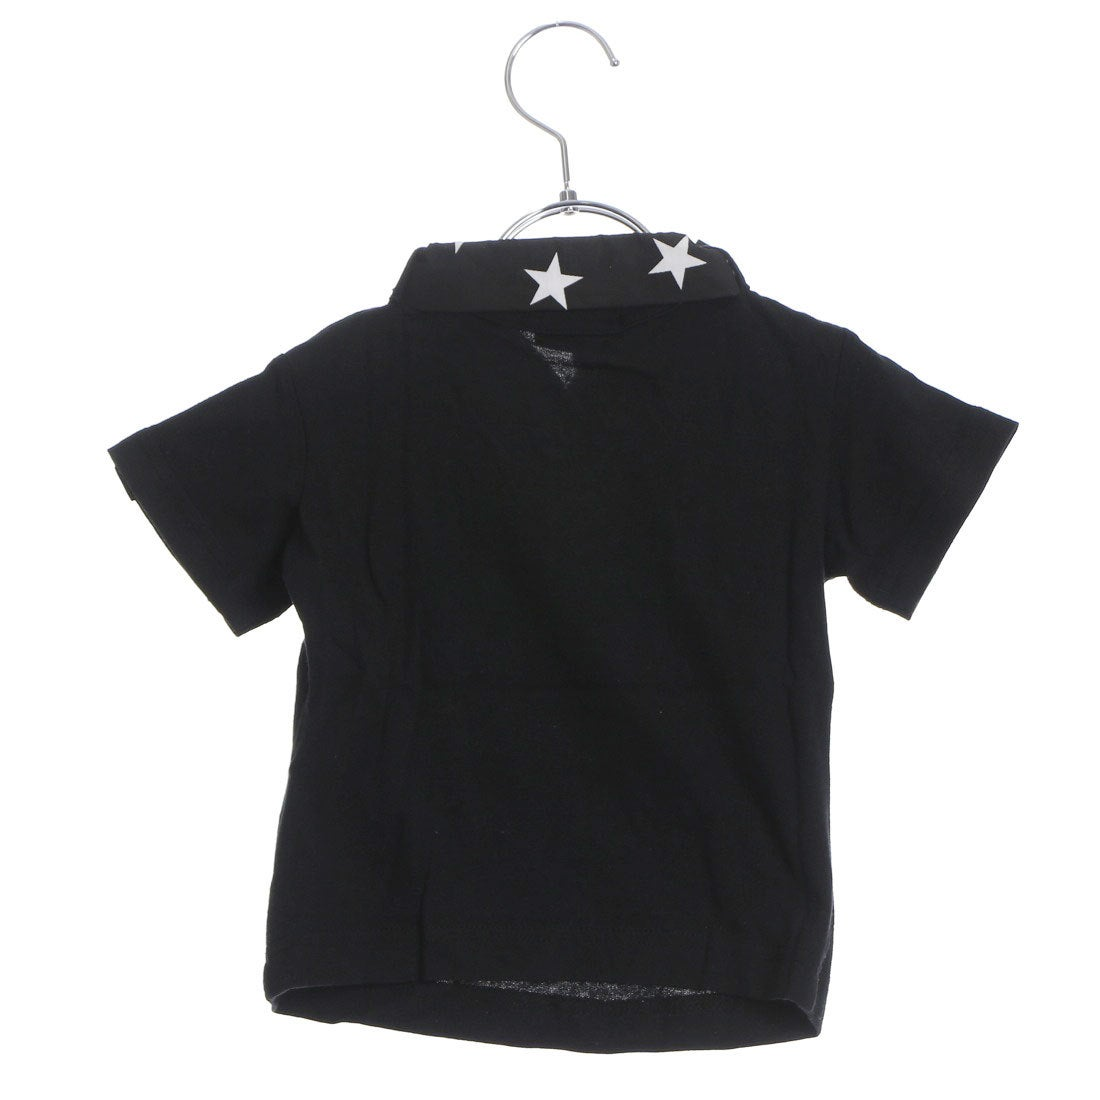 e59c8550792f3 このアイテムを見ている人におすすめ. チャンピオン Champion Champion チャンピオン ビッグロゴ 刺繍ロゴ キッズTシャツ ...